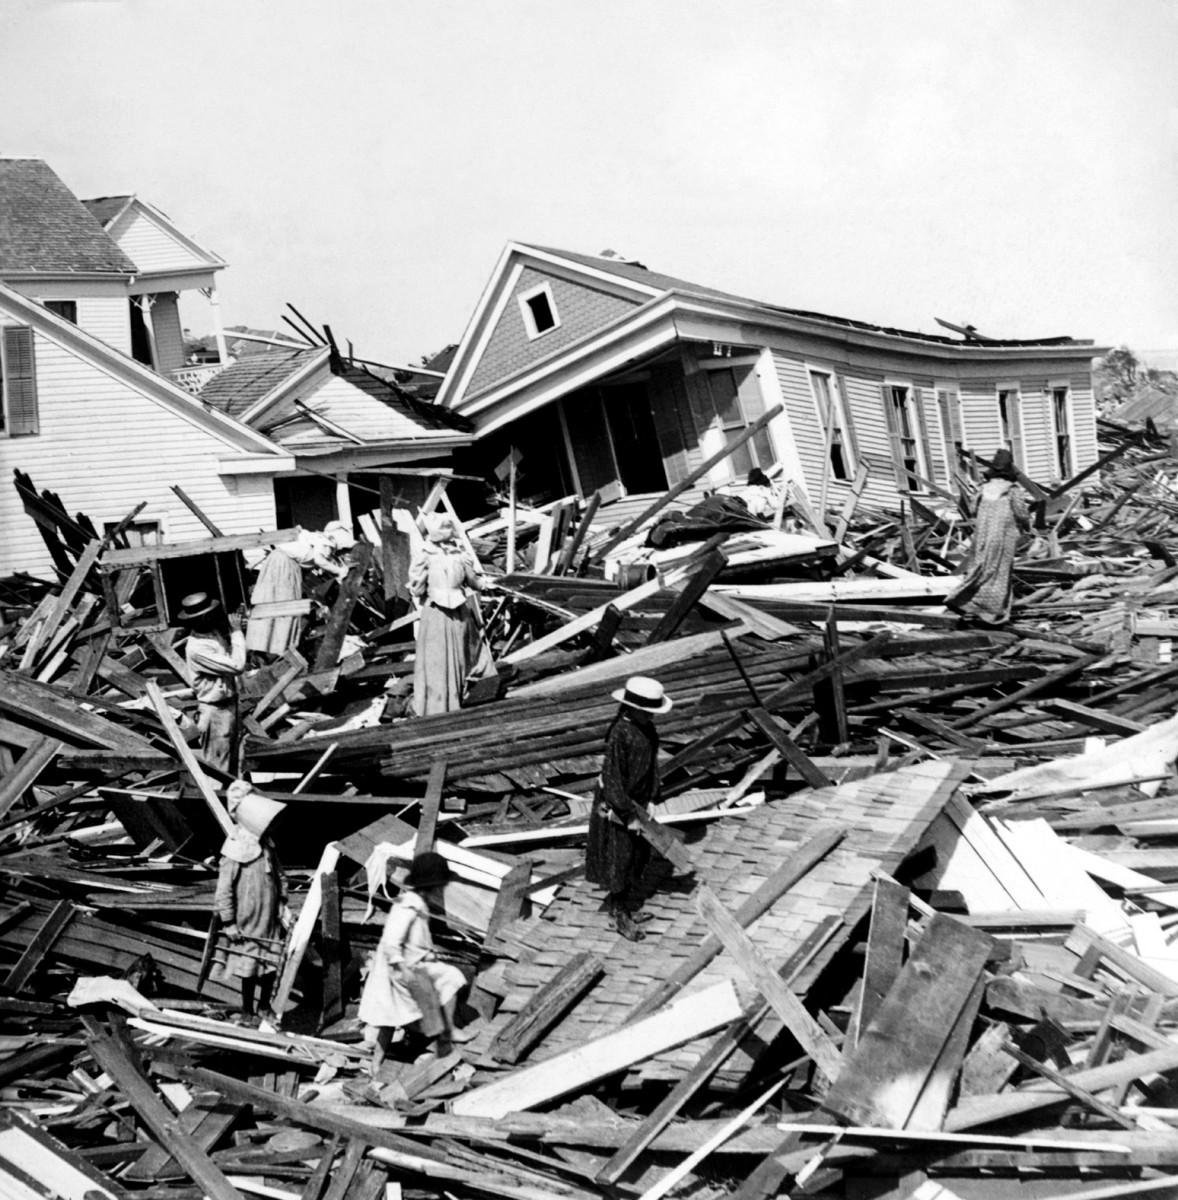 Galveston search the wreckage of the 1900 Hurricane,